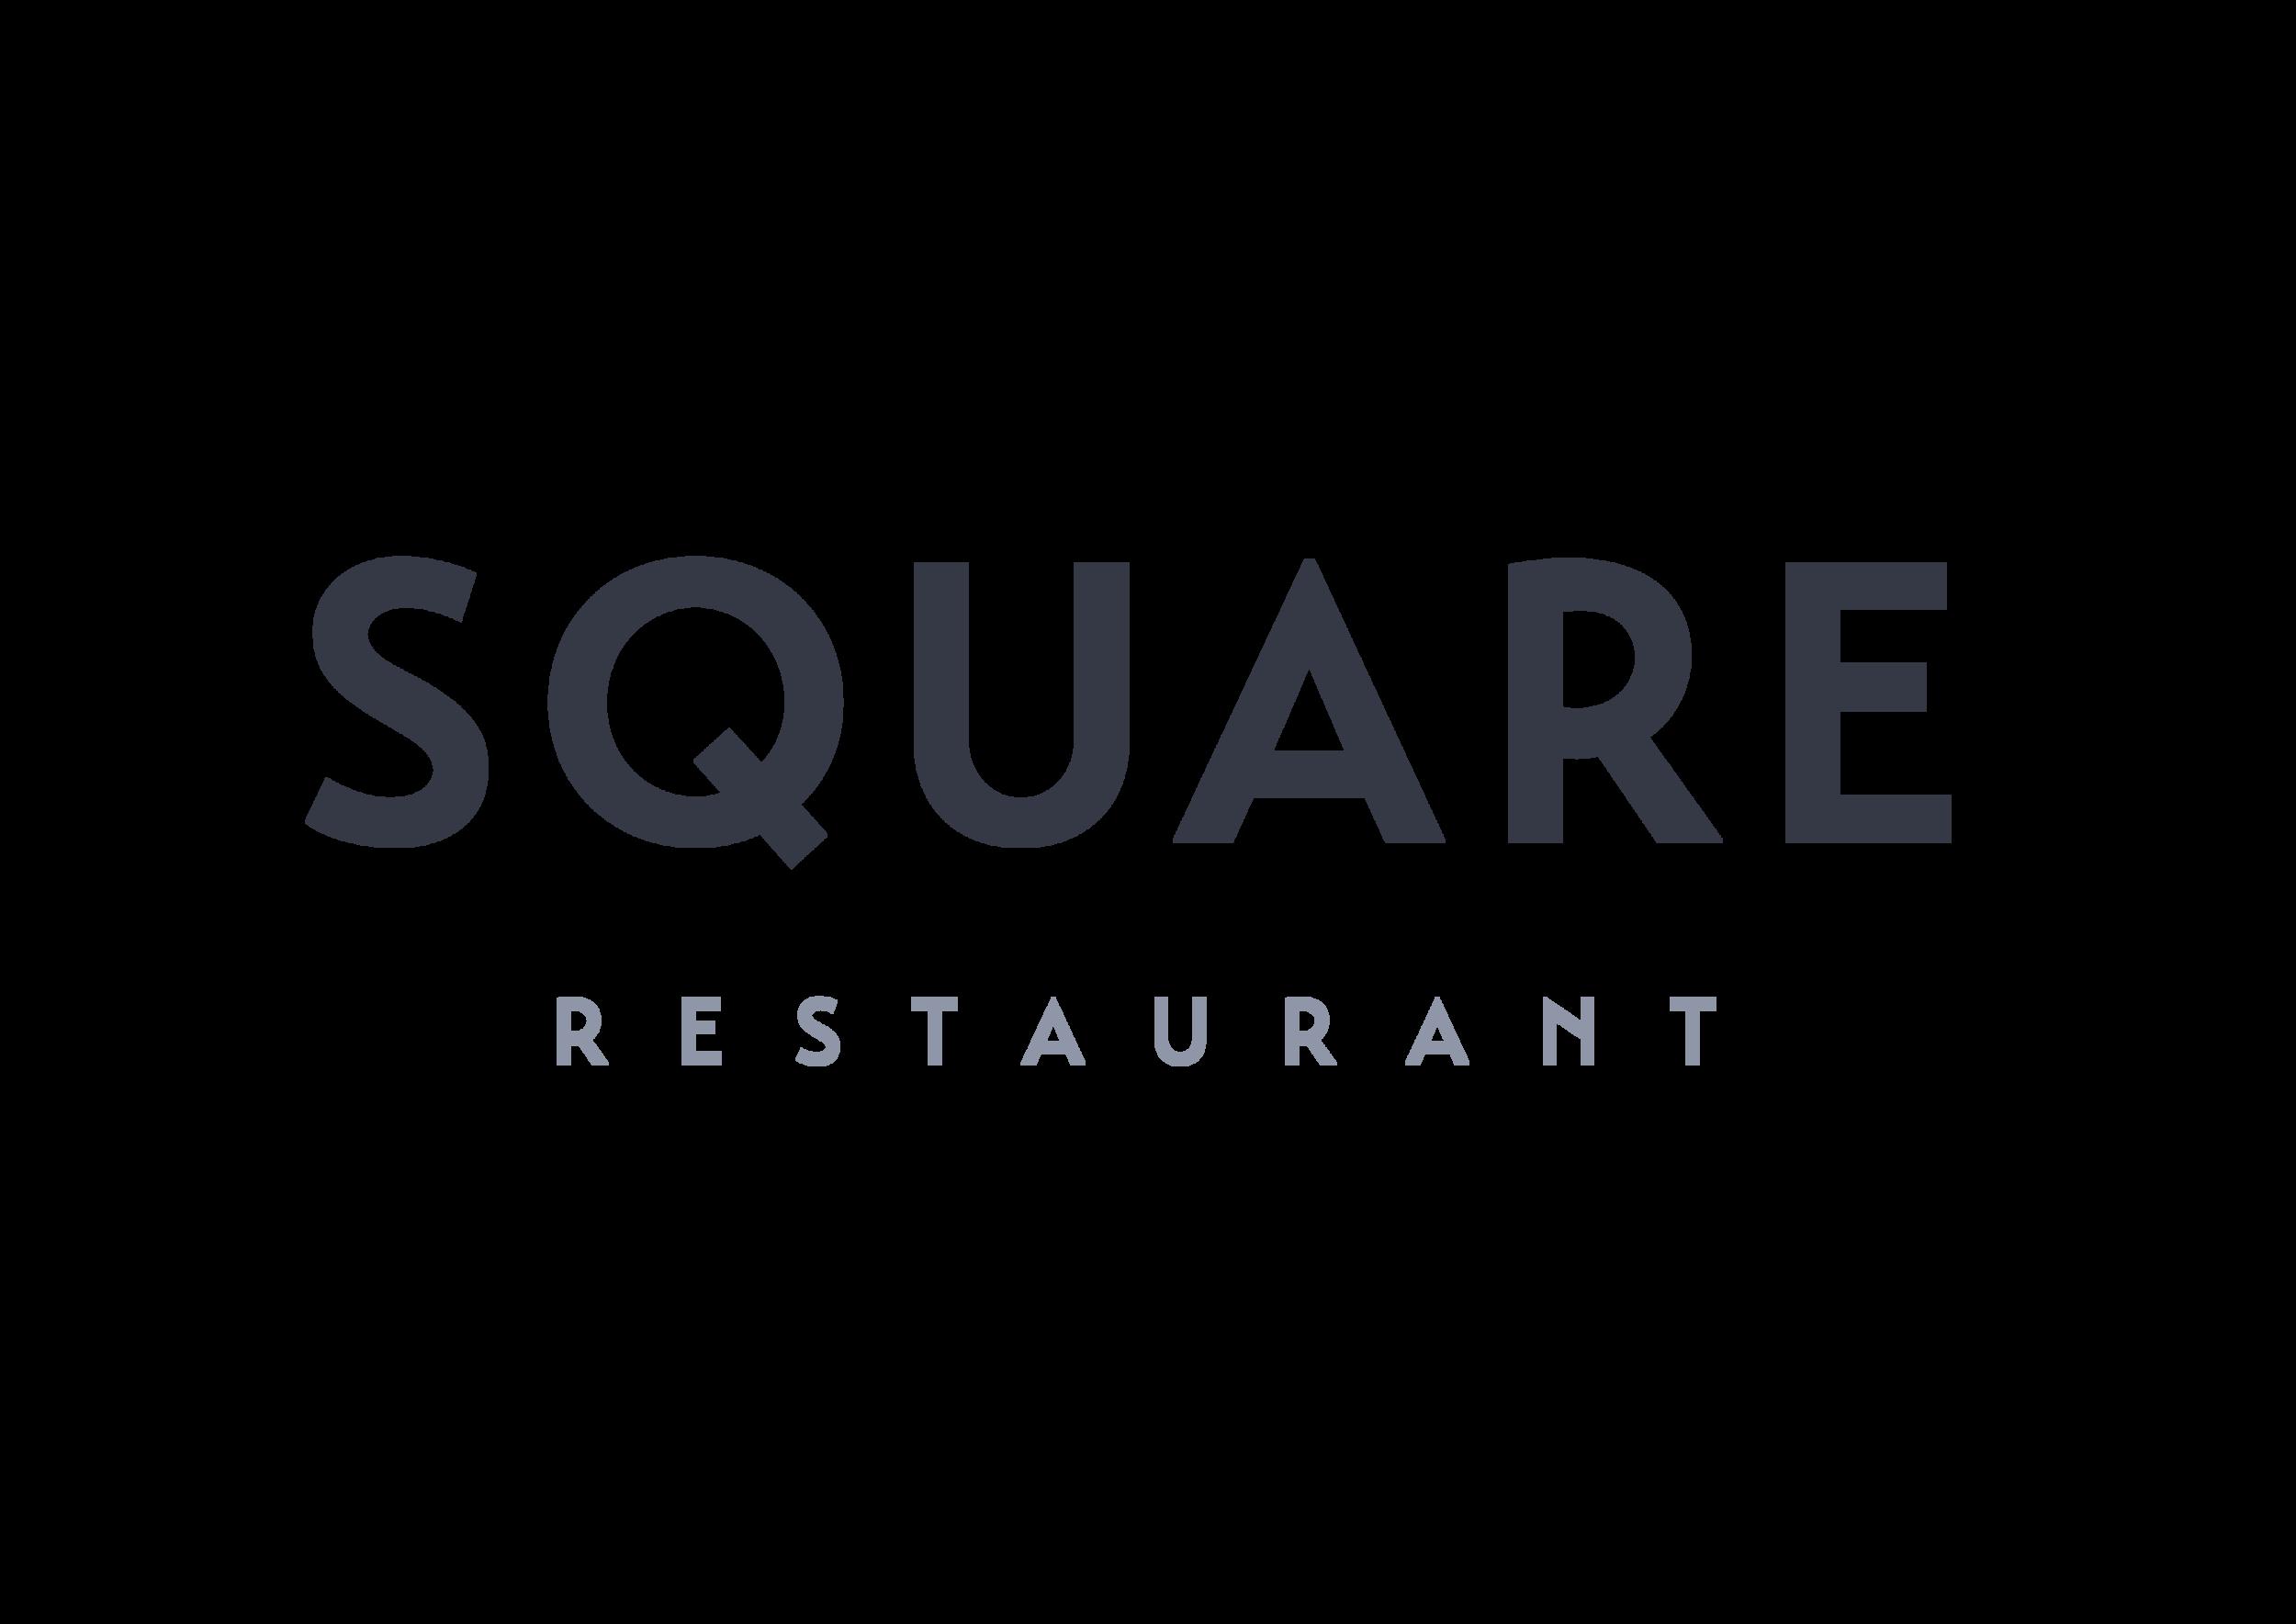 Square_logo-09.png